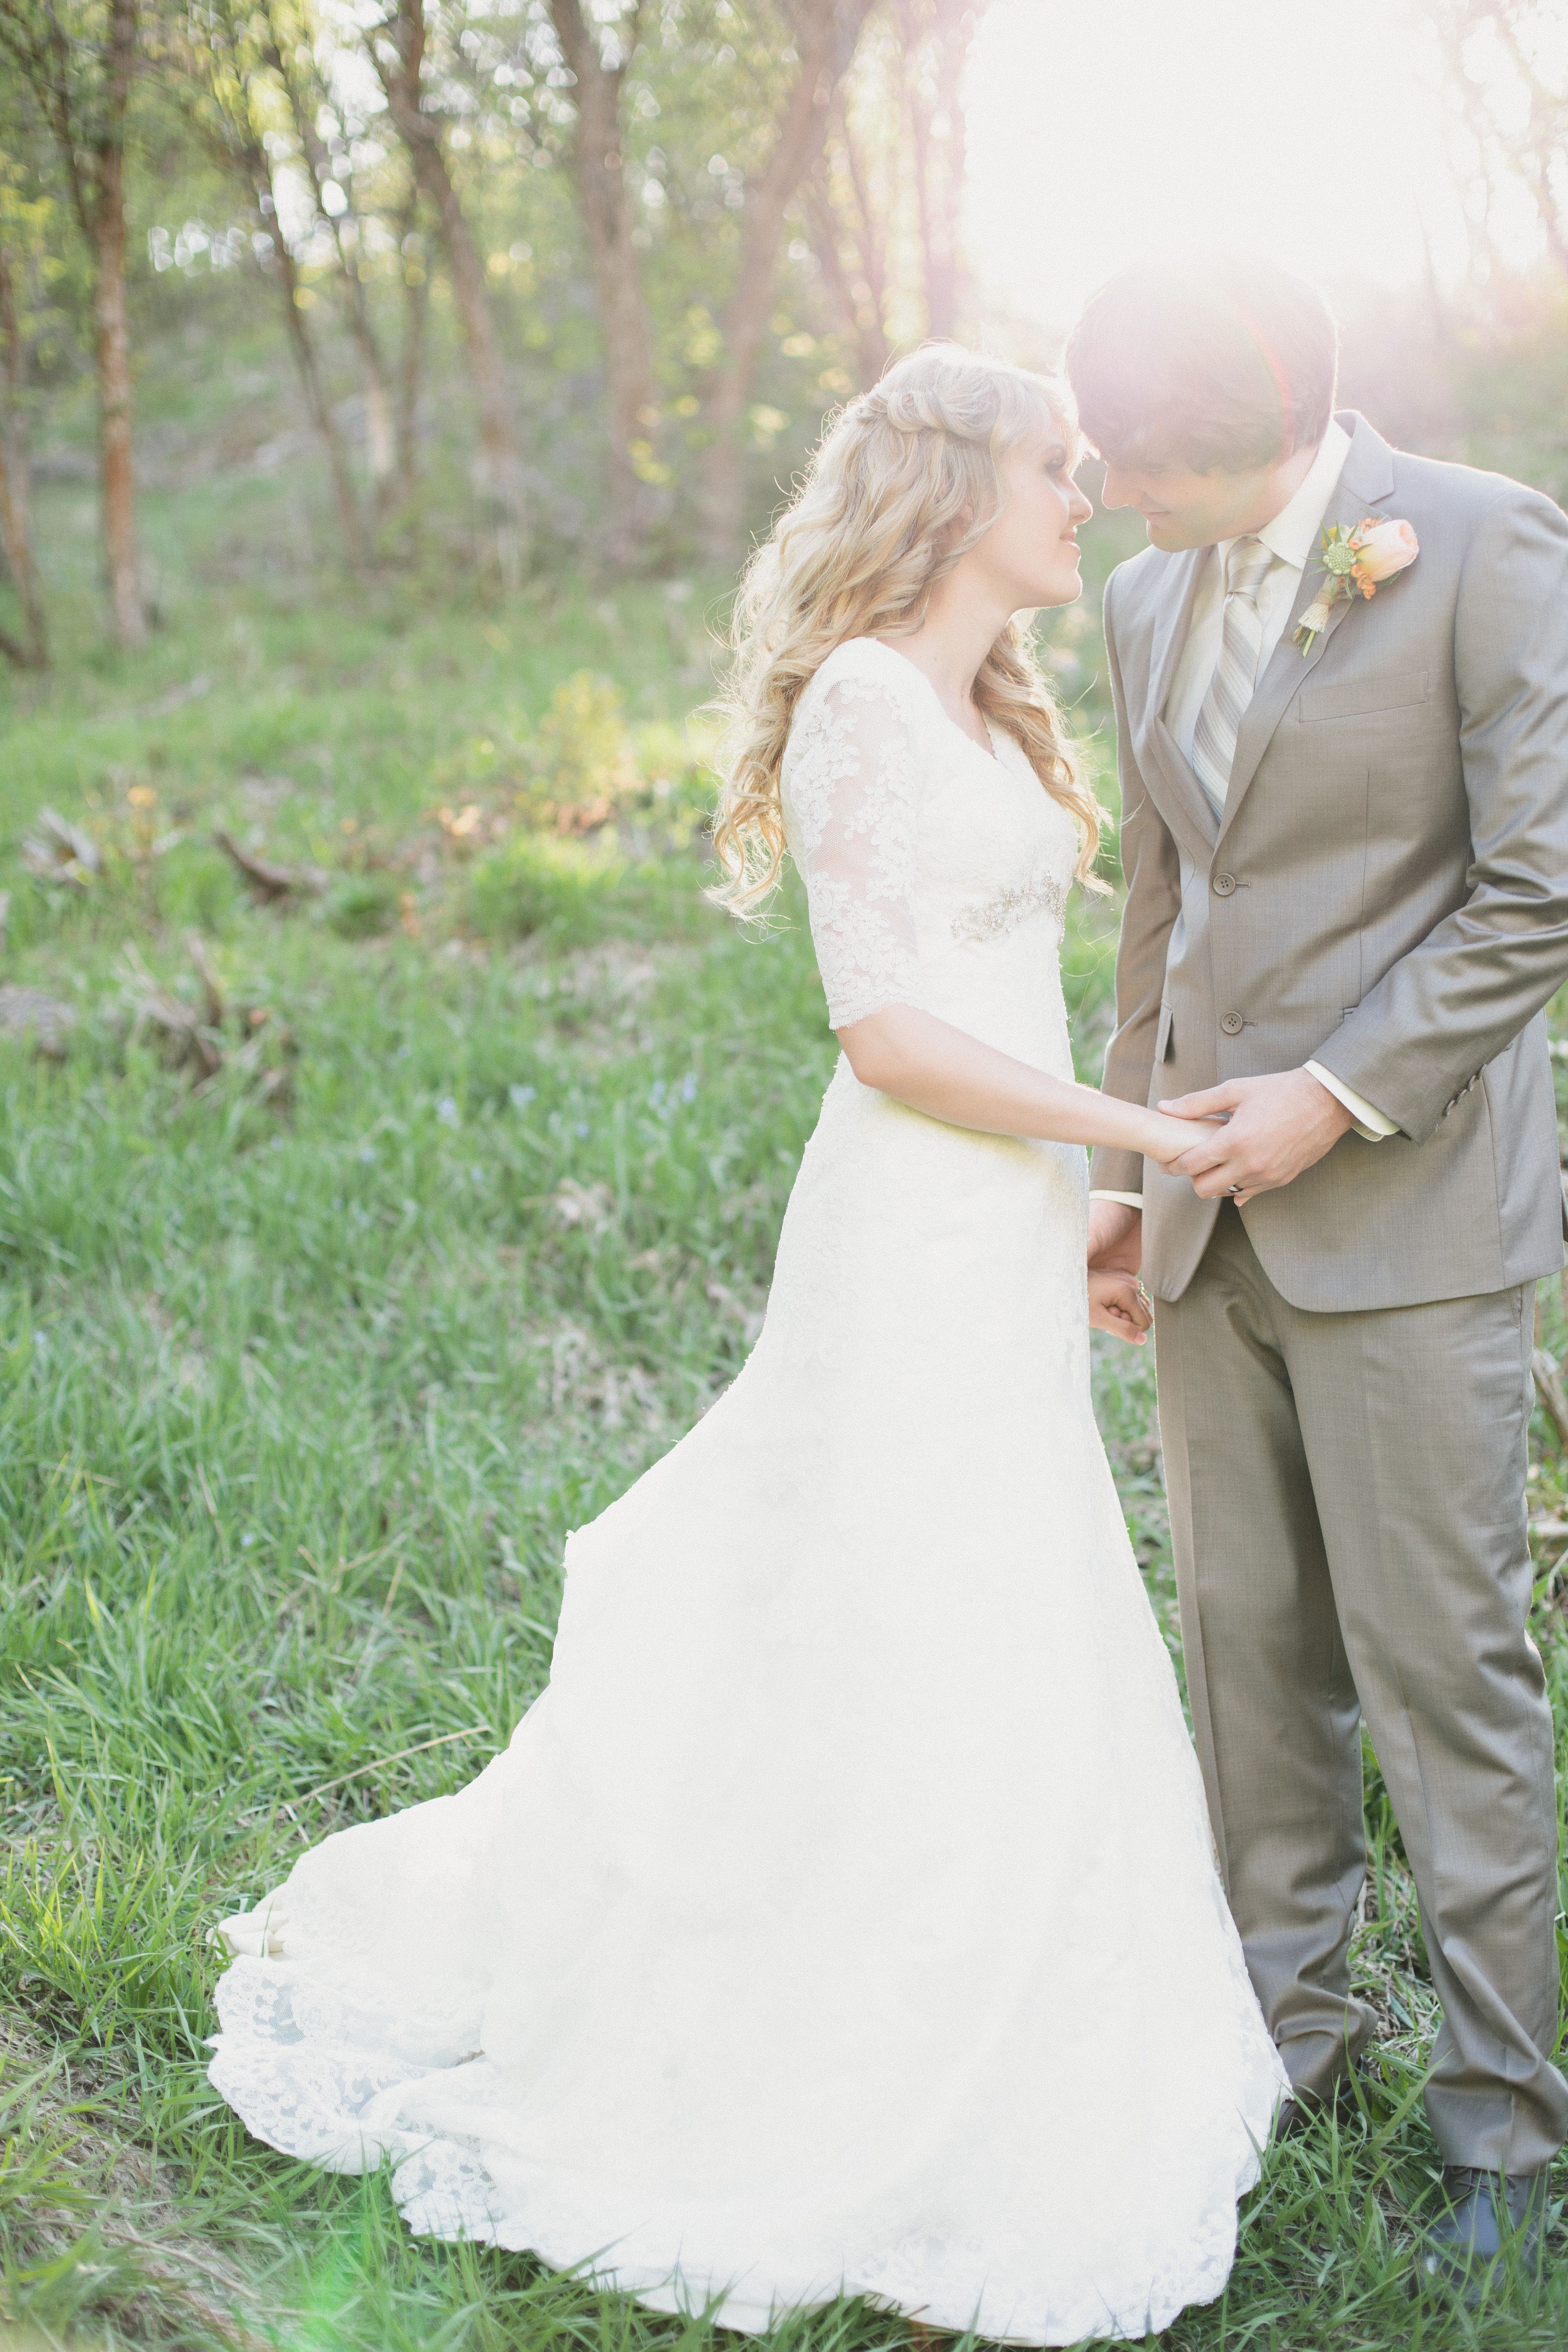 Allure 8825 Lace Sleeve Wedding Dress Modest Dresses 3 4